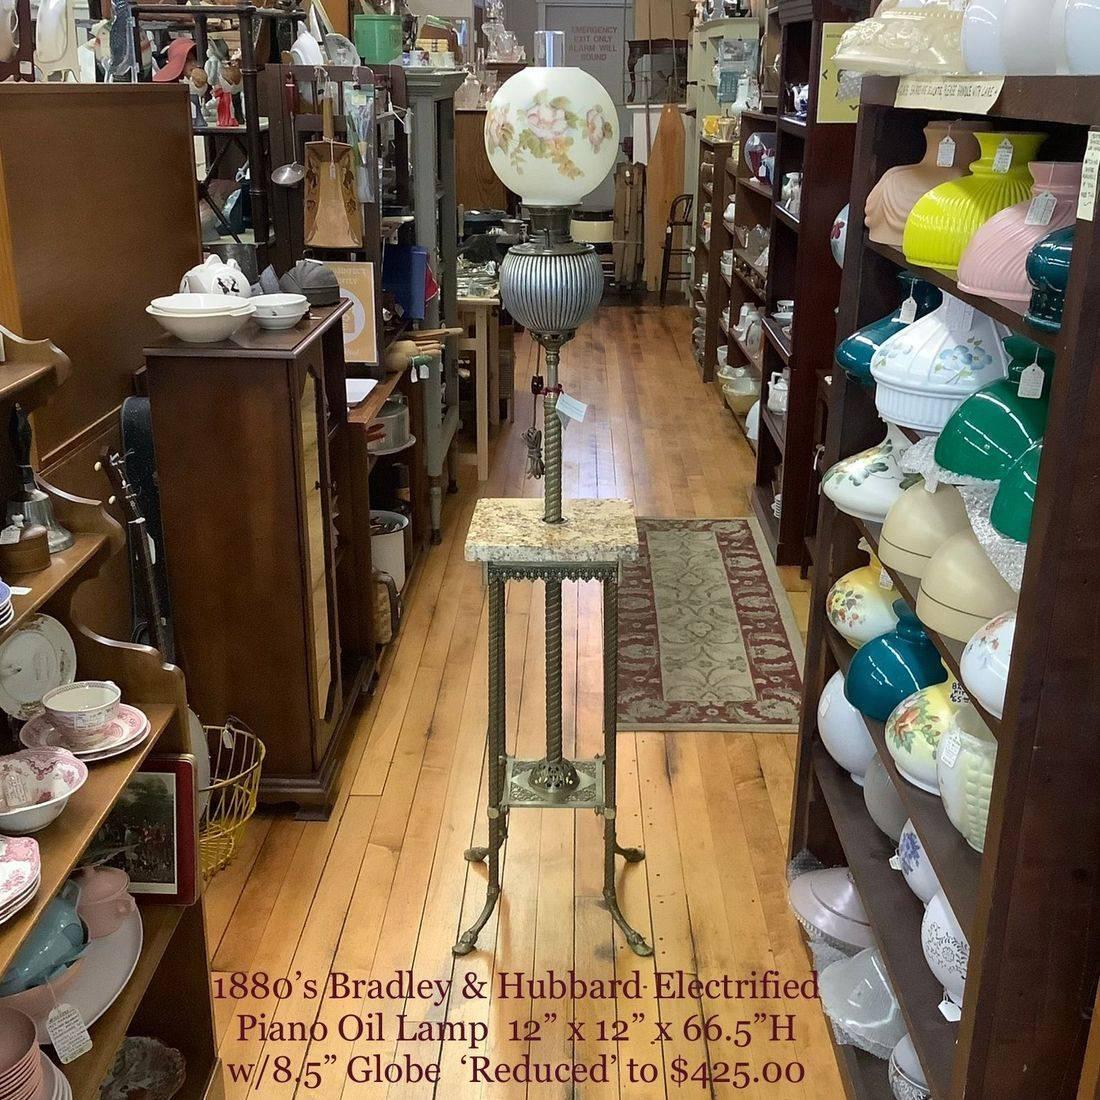 1880's Bradley & Hubbard Electrified Piano Oil Lamp   $425.00